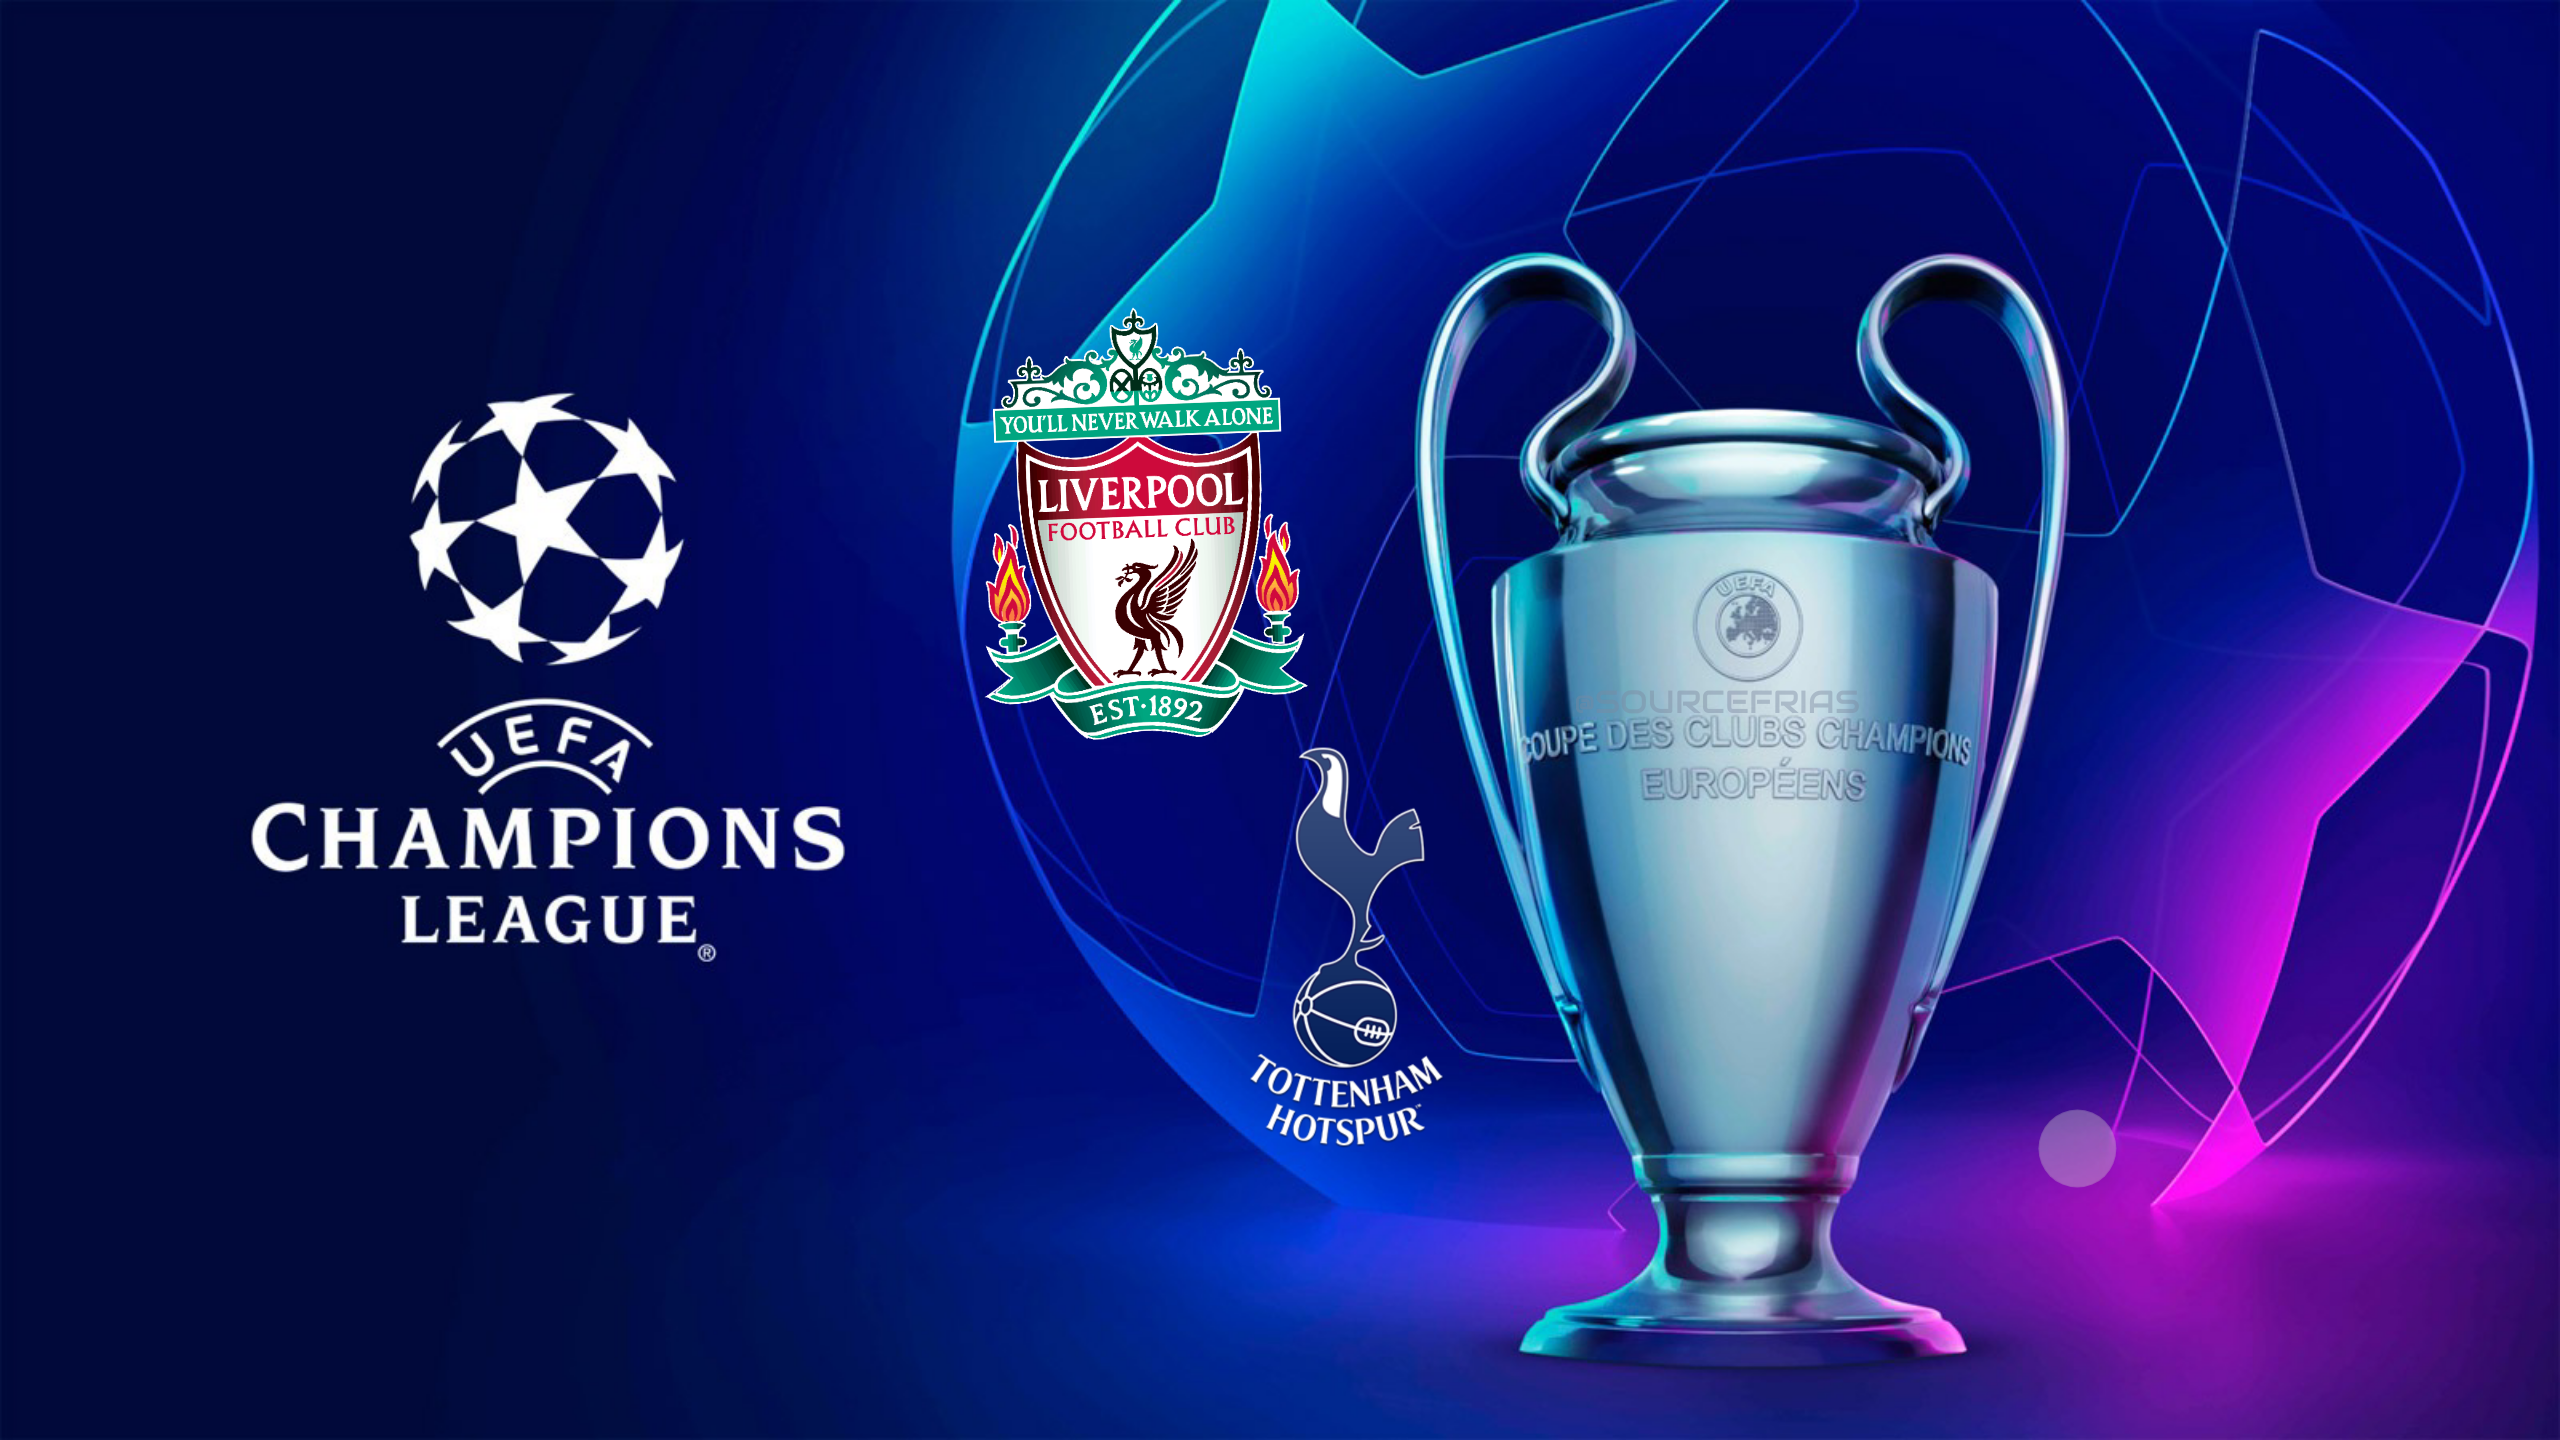 Champions League Final 2019   Liverpool vs Tottenham   World in Sport 2560x1440